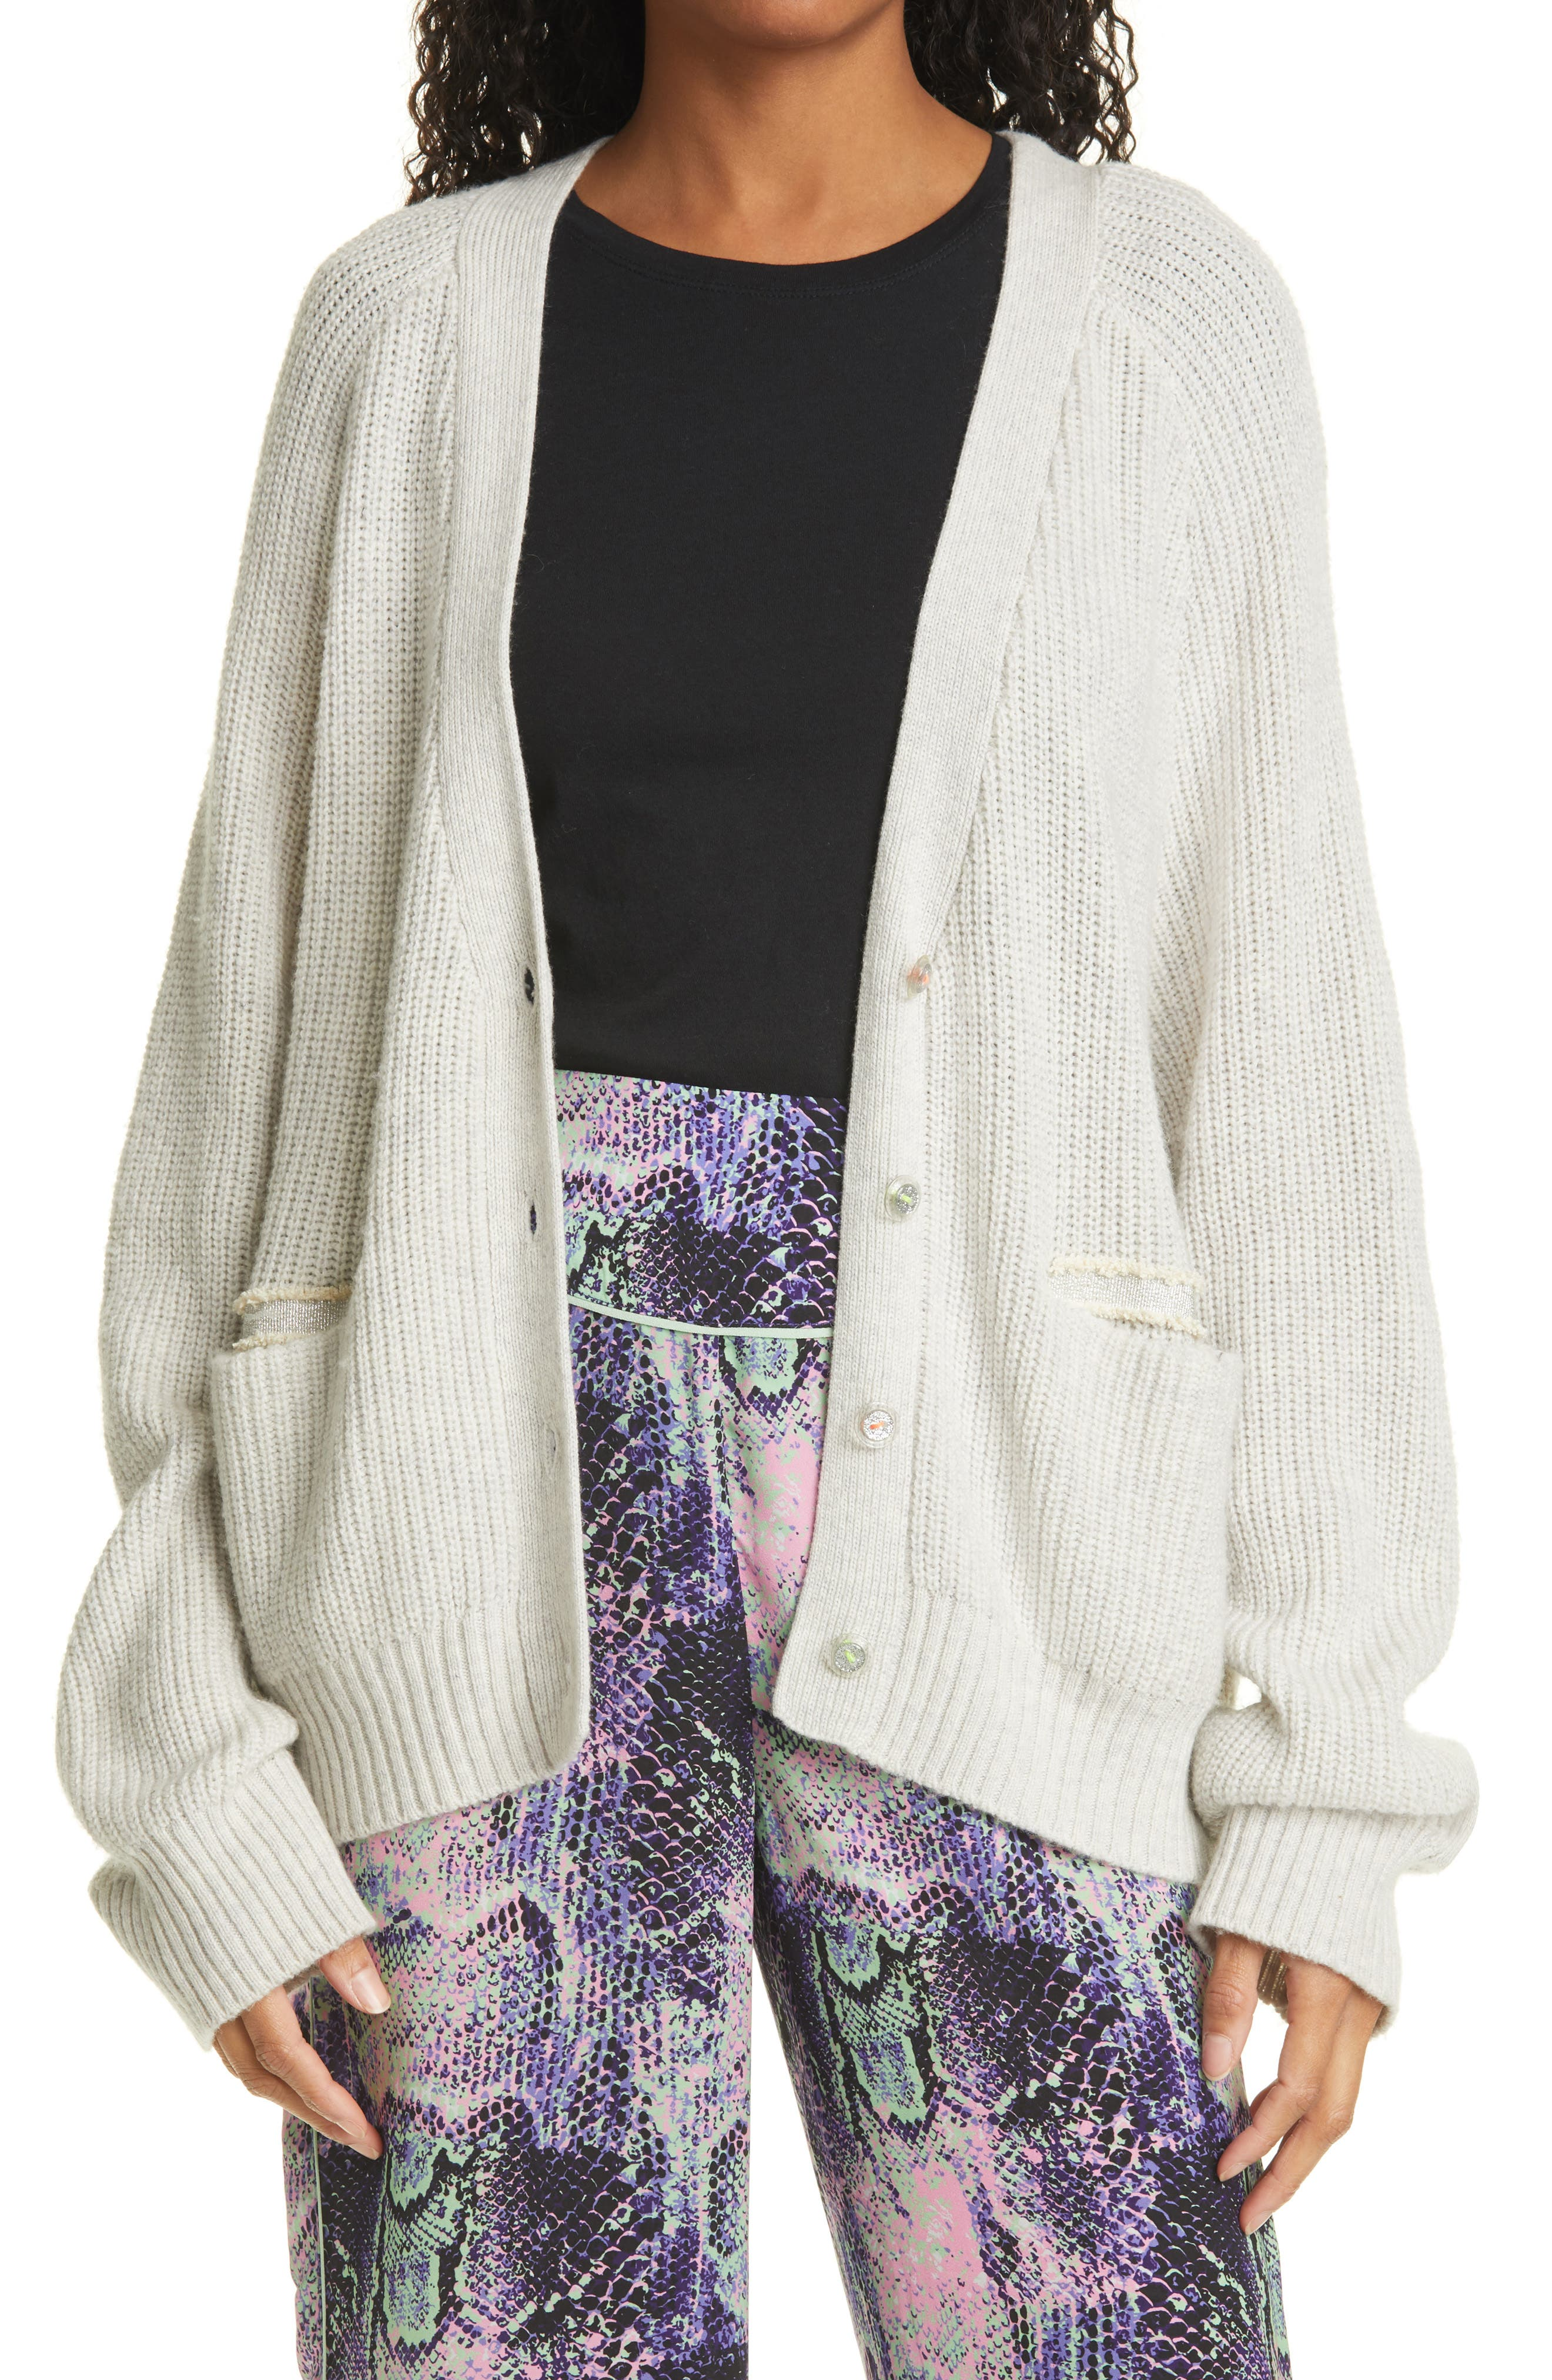 Off White women cardigan \u2022 Linen boho cover up \u2022 Wrap cardigan \u2022 Organic linen \u2022 White robe coat \u2022 linen kimono sweater \u2022 Jacket with belt \u2022